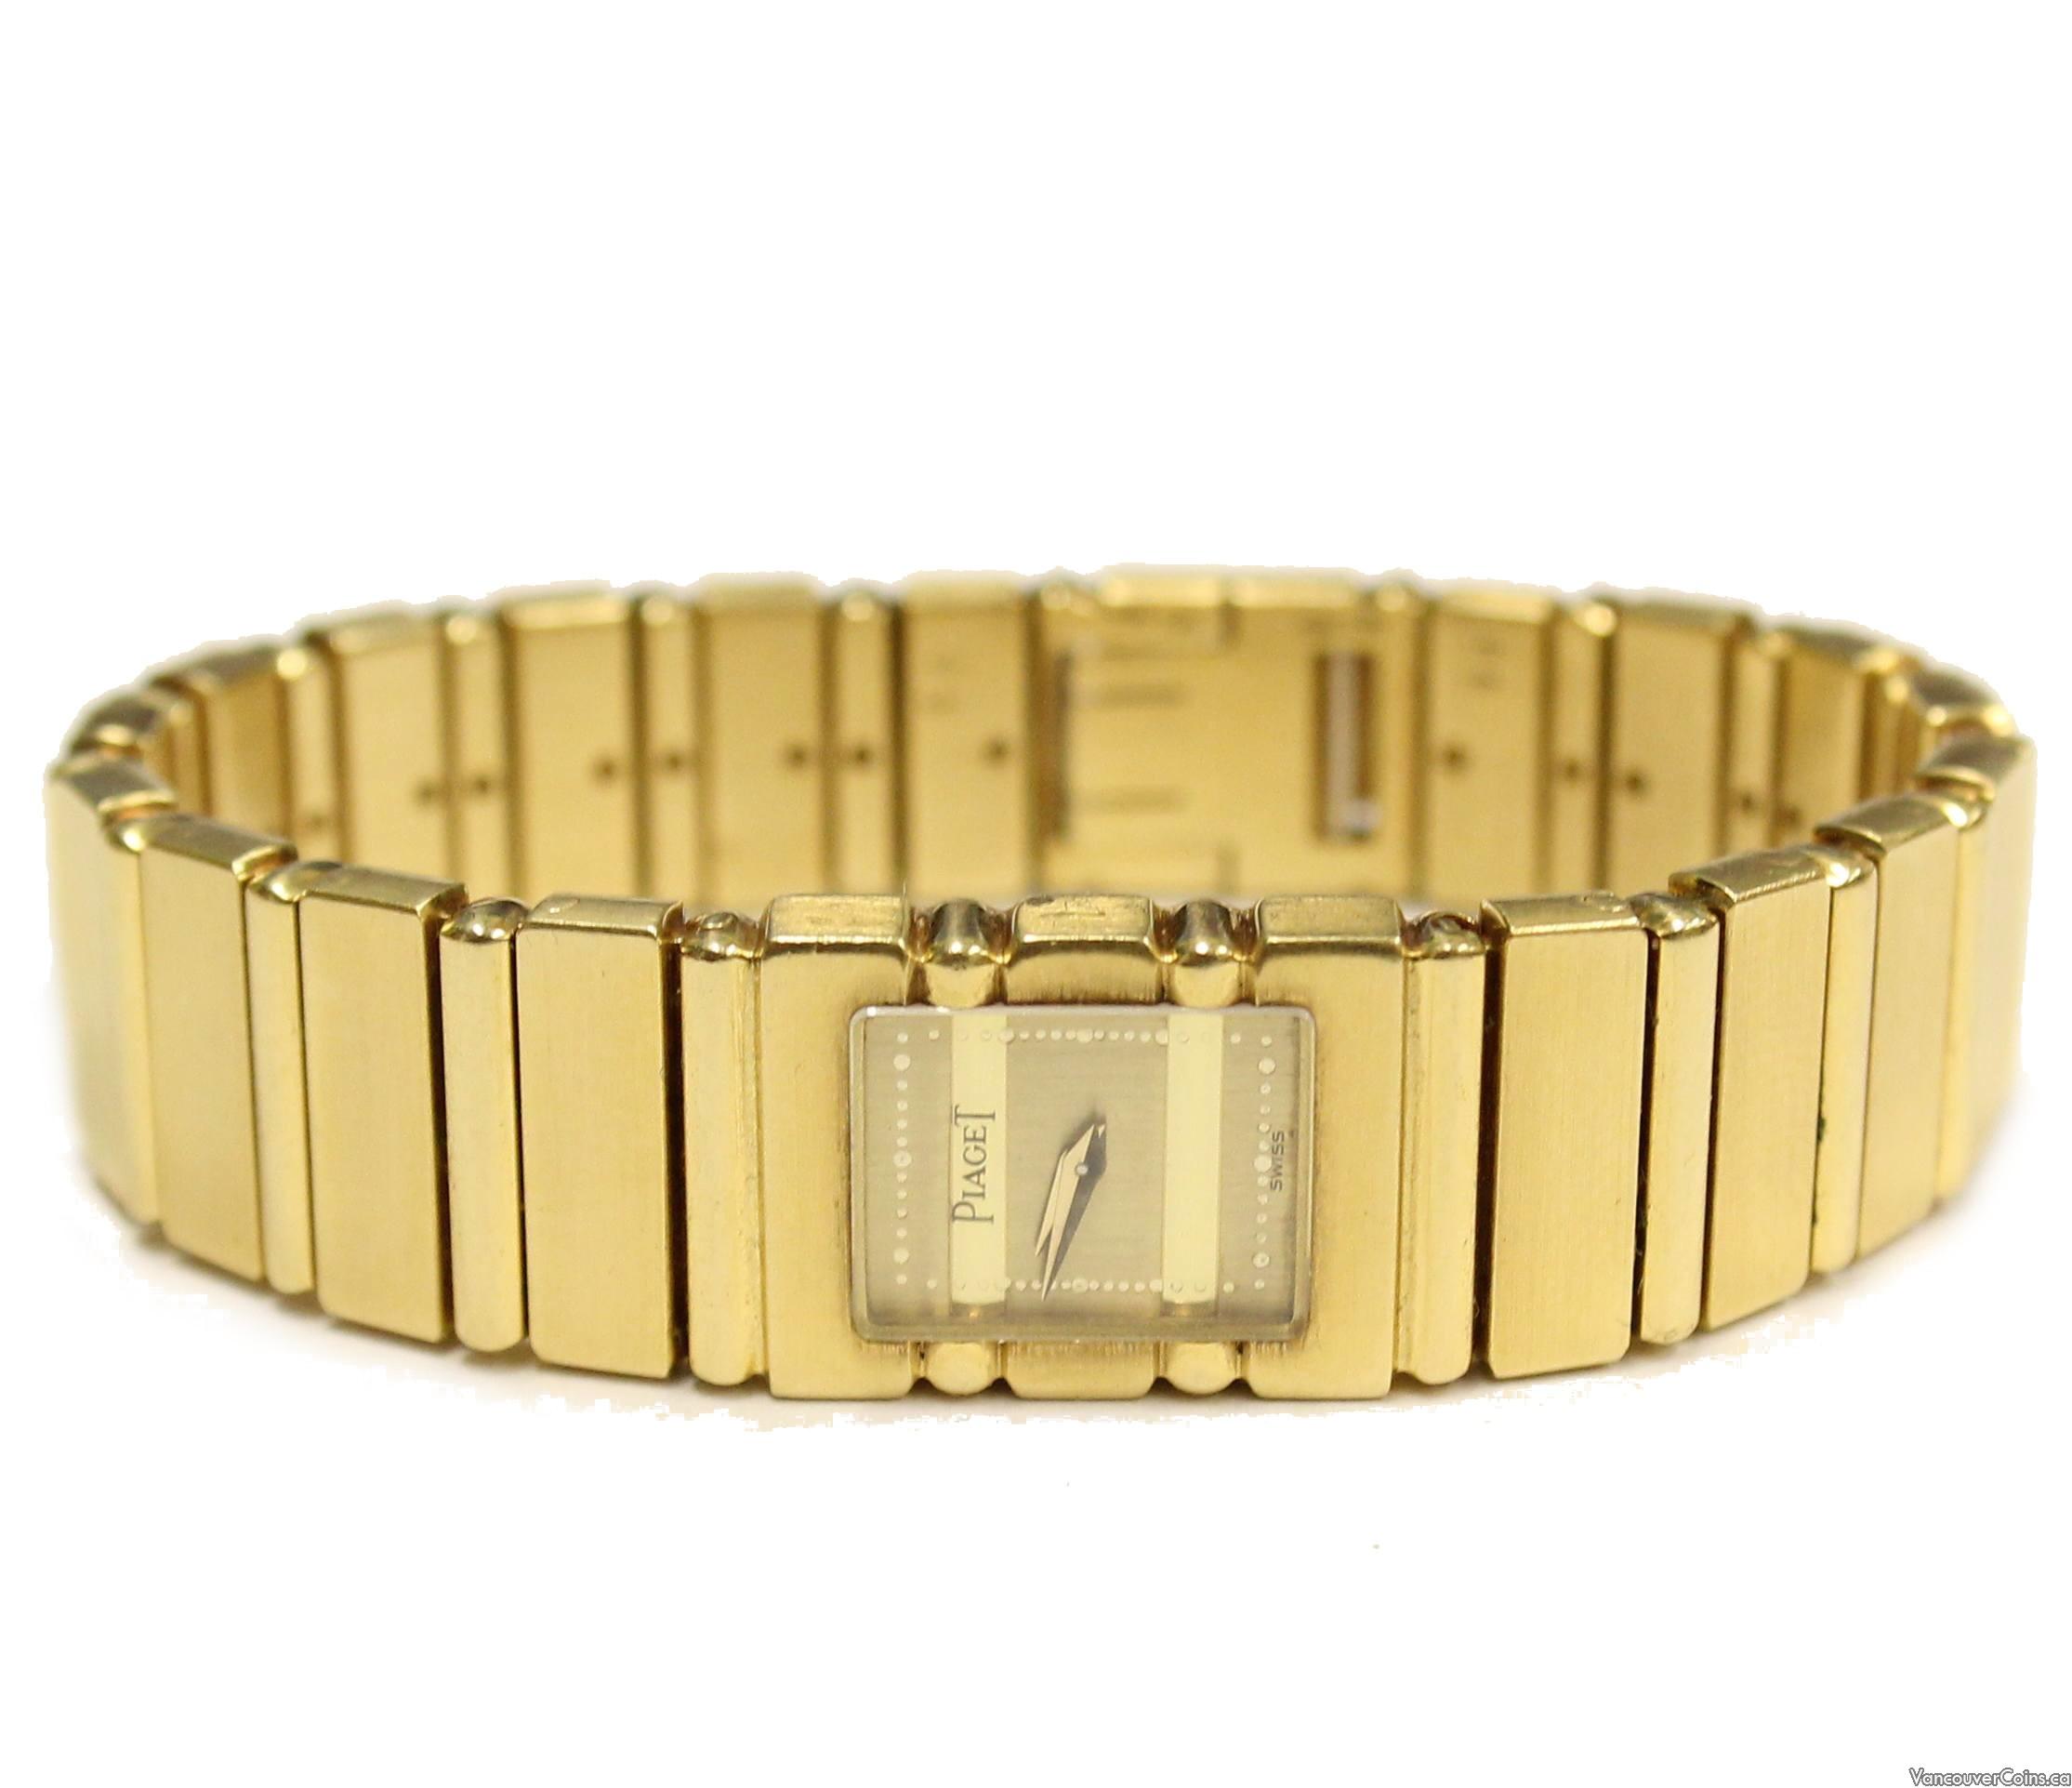 Piaget 18k Solid Gold Polo Ladies Quartz Swiss Watch